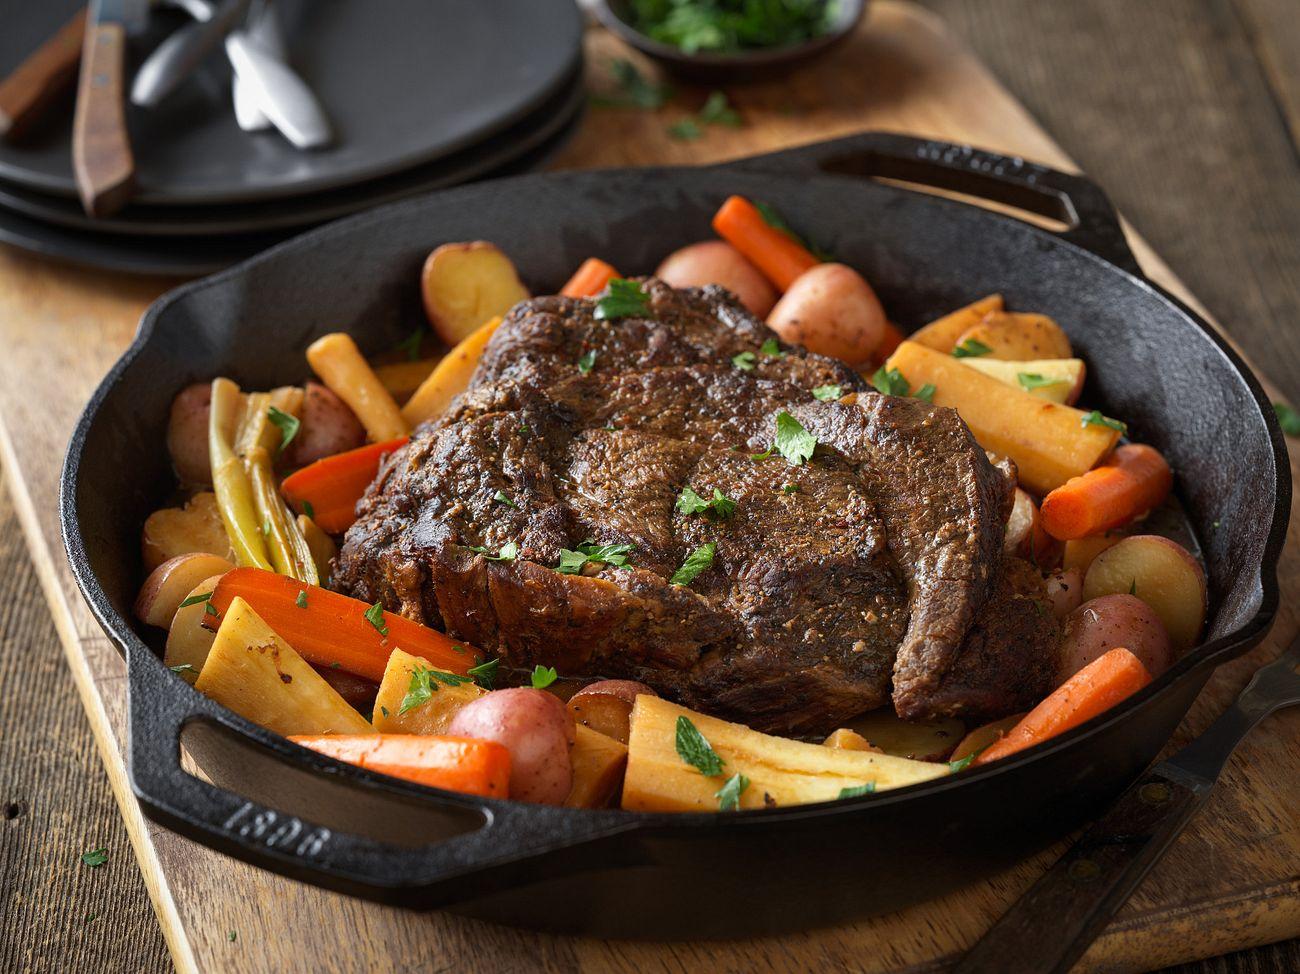 north-woods-hearty-beef-pot-roast-horizontal